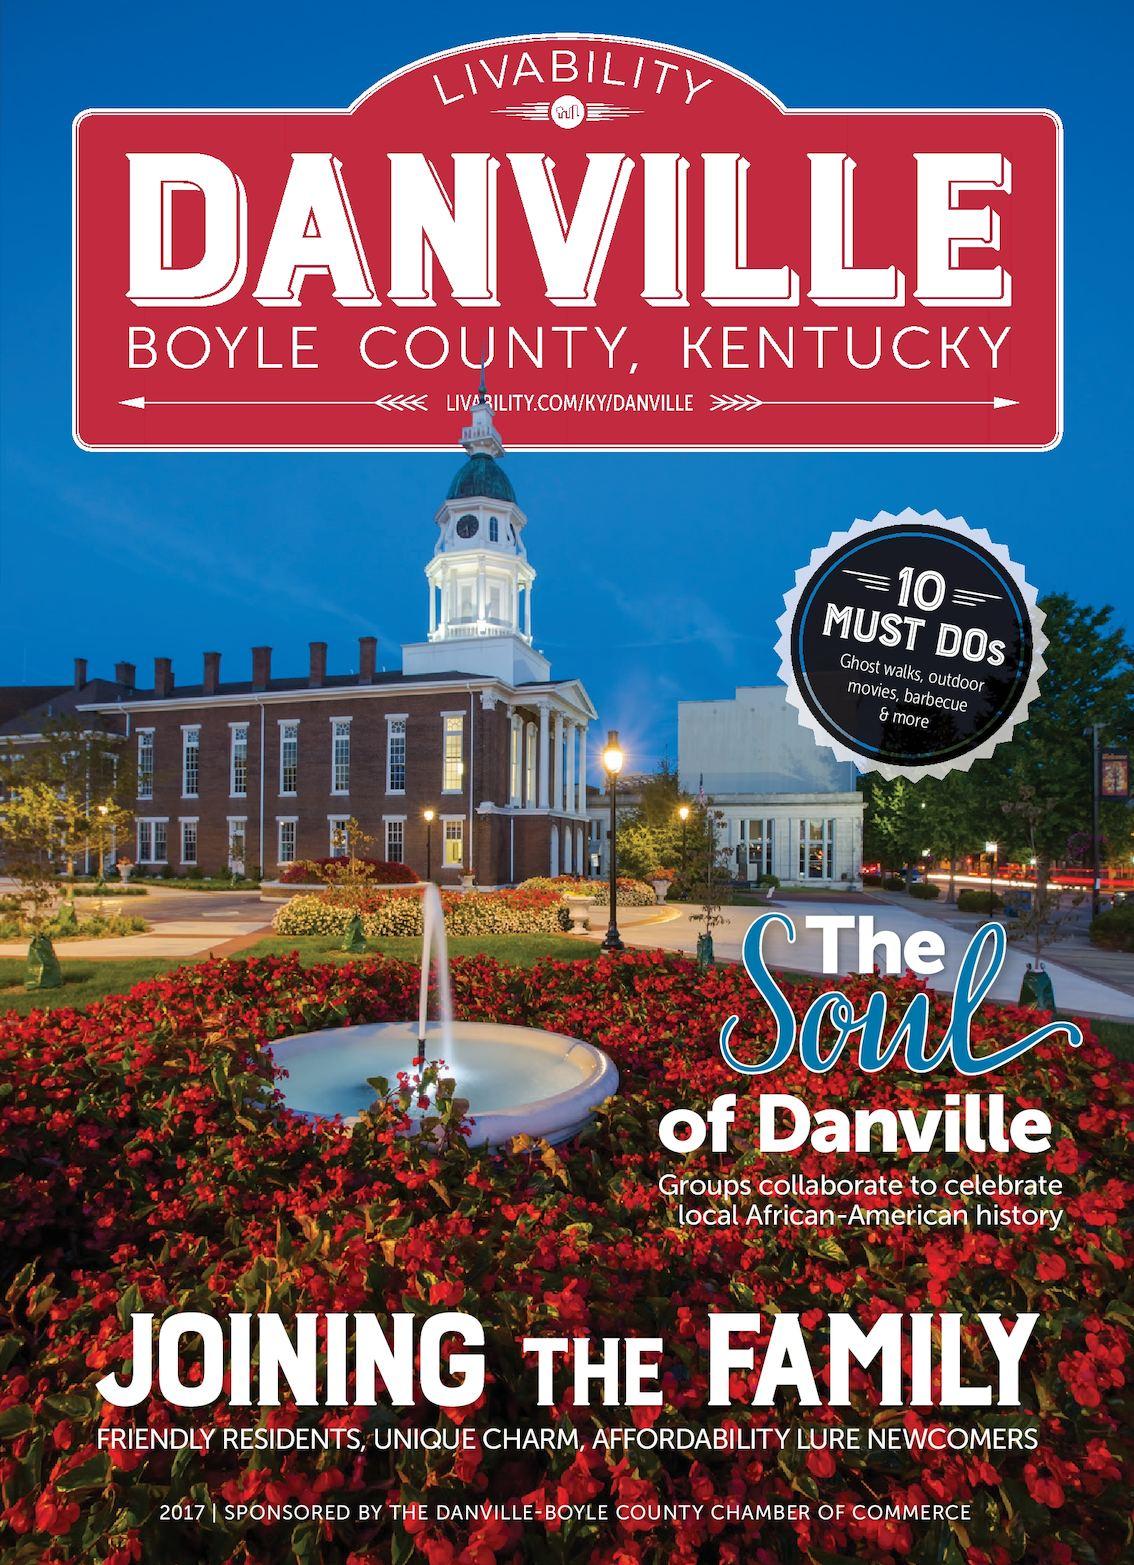 Calamo Livability Danville Boyle County Ky 2017